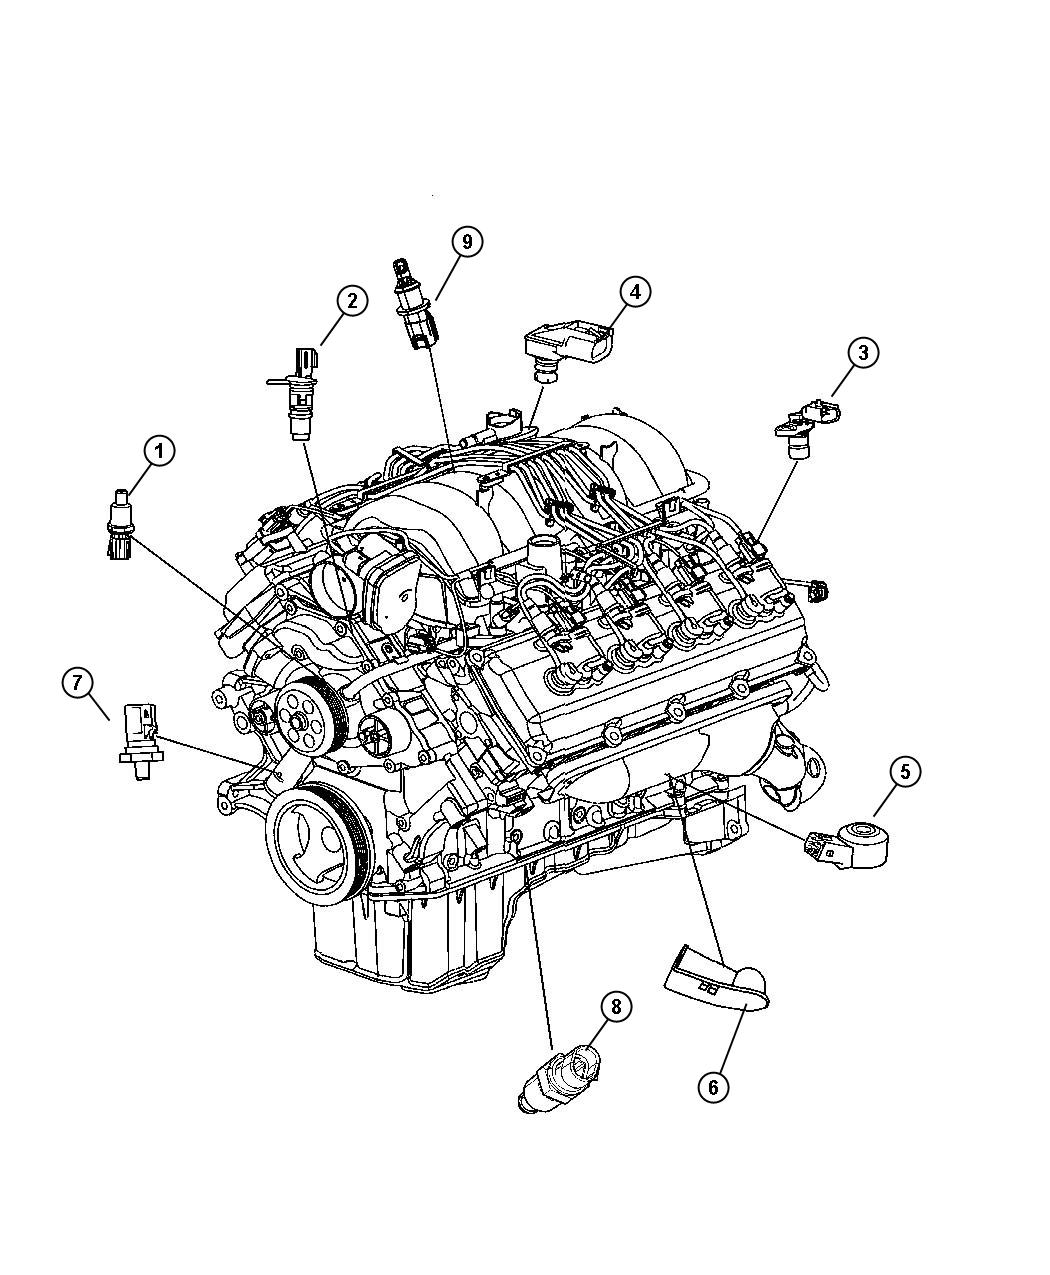 Jeep Grand Cherokee Sensor. Coolant temperature, fluid